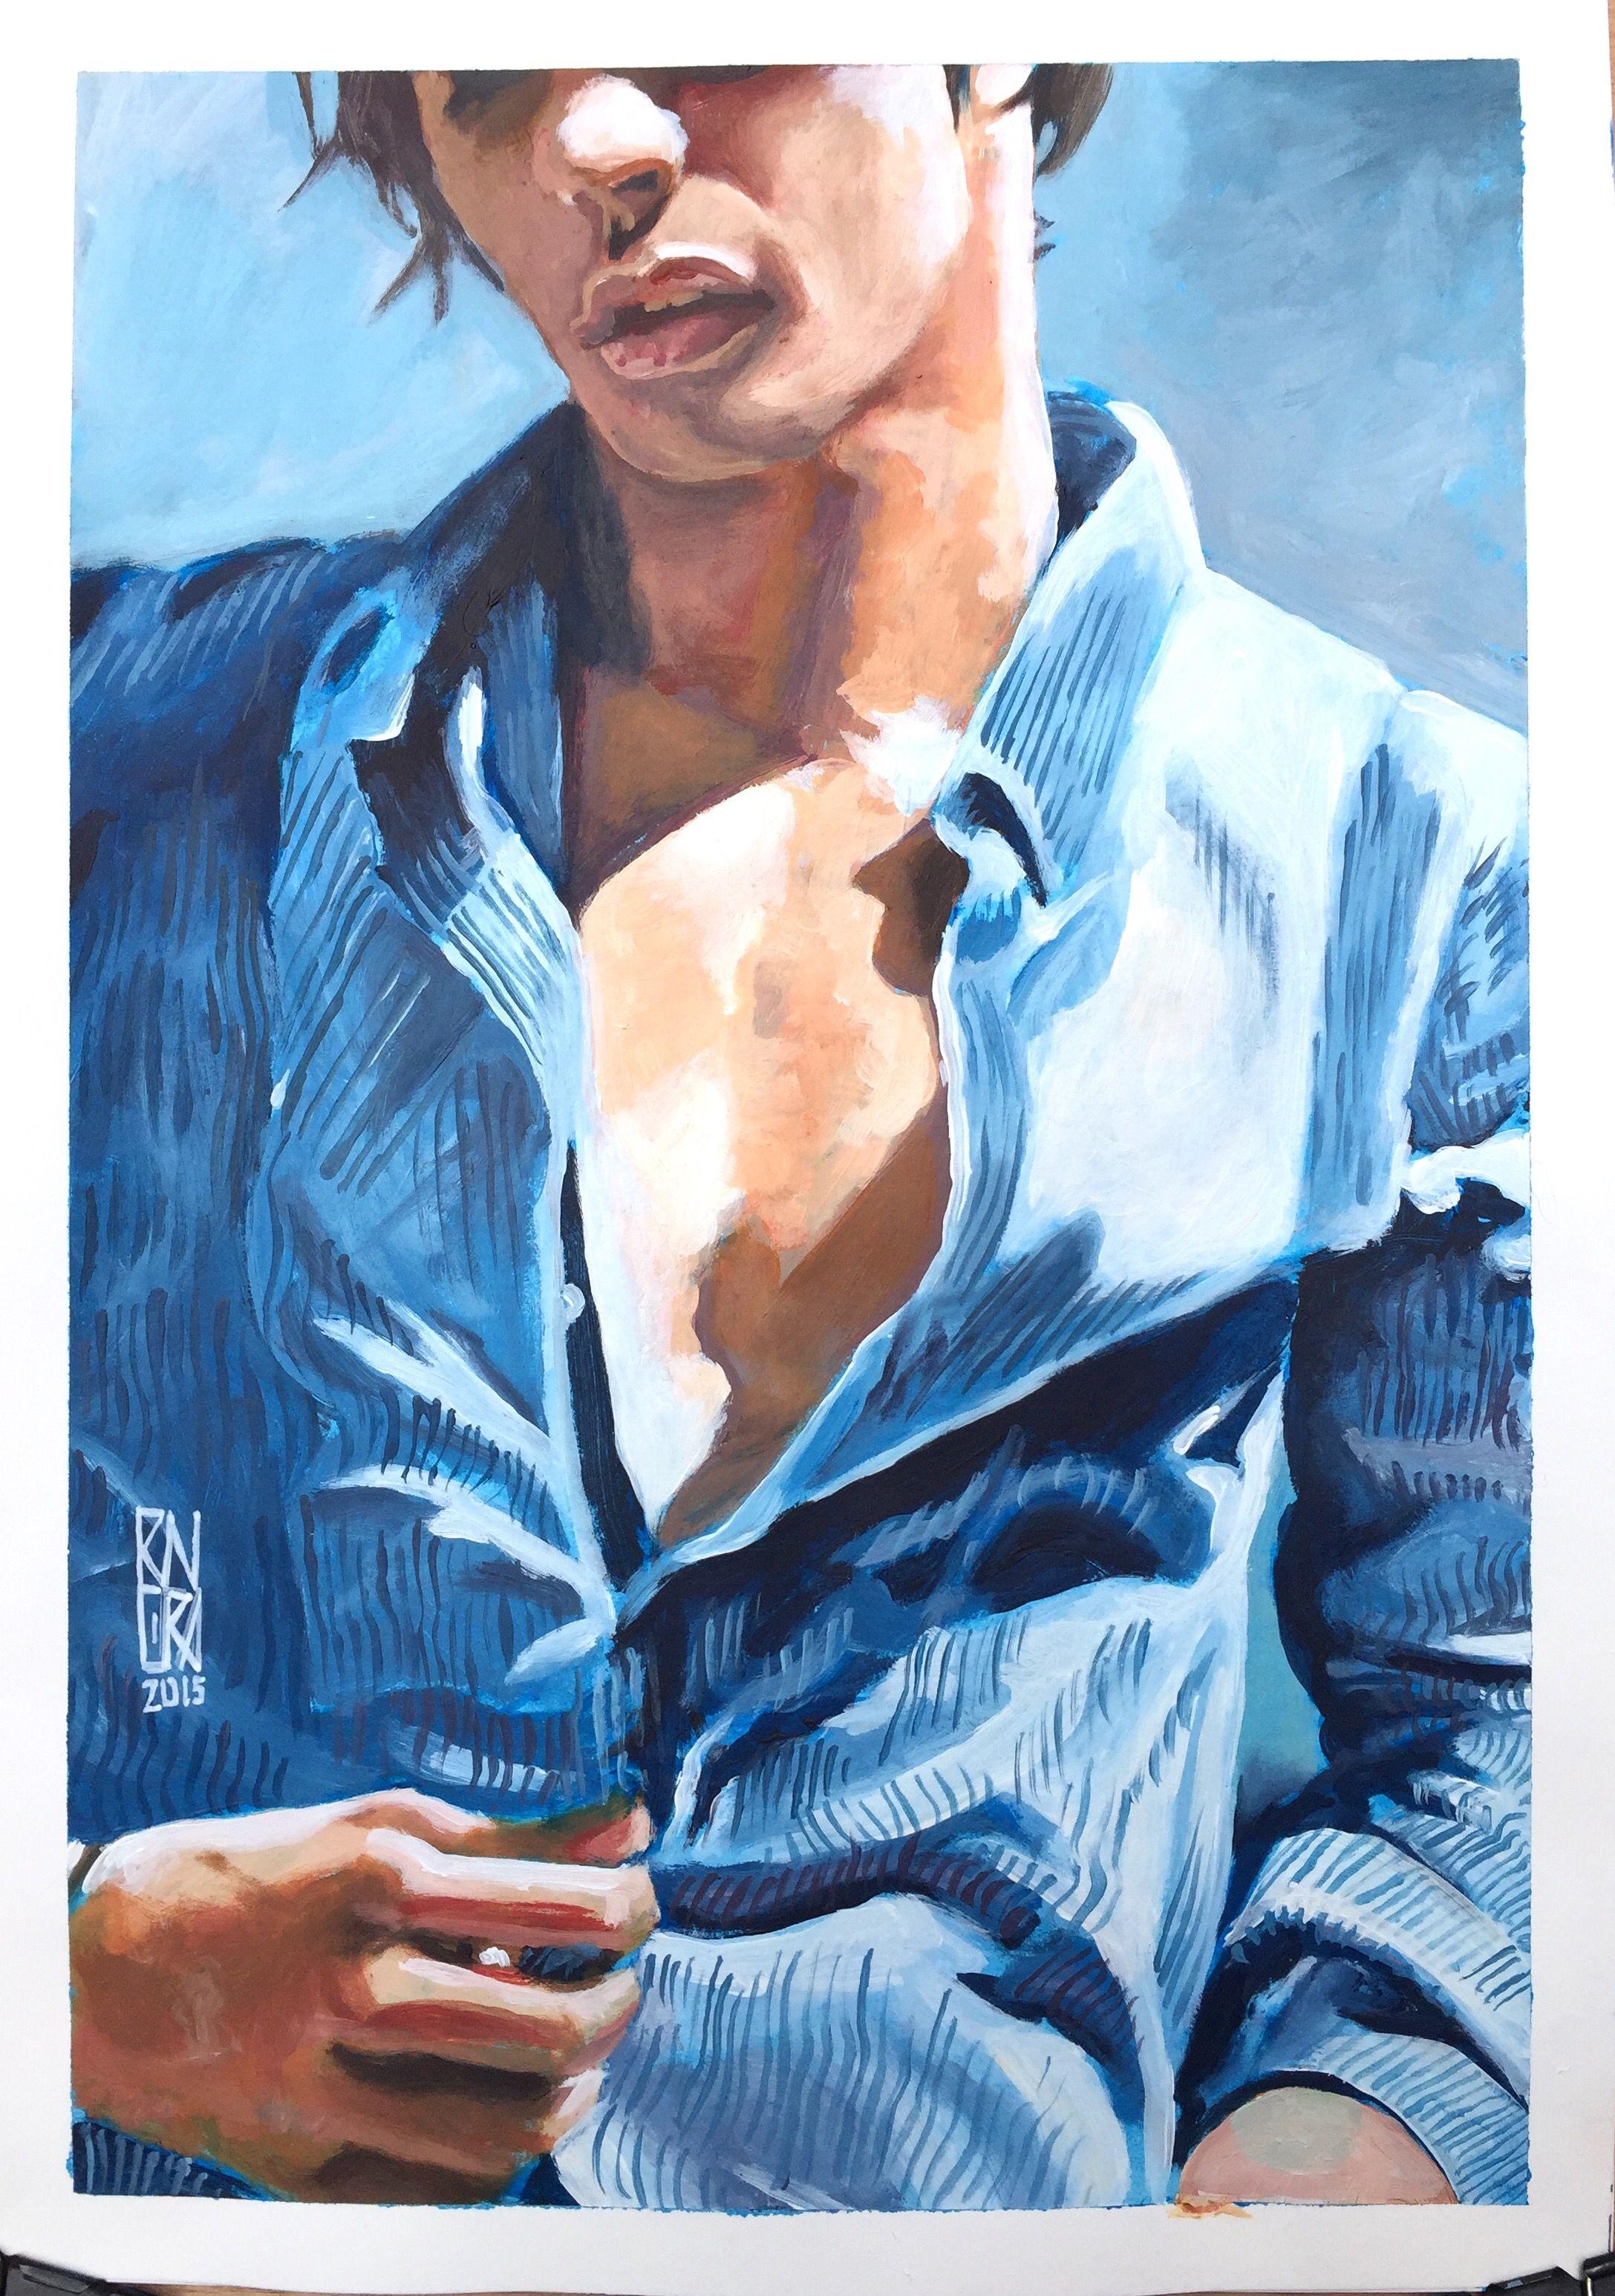 Male figure by #RichardRivera acrylic on paper | ART | Pinterest ...